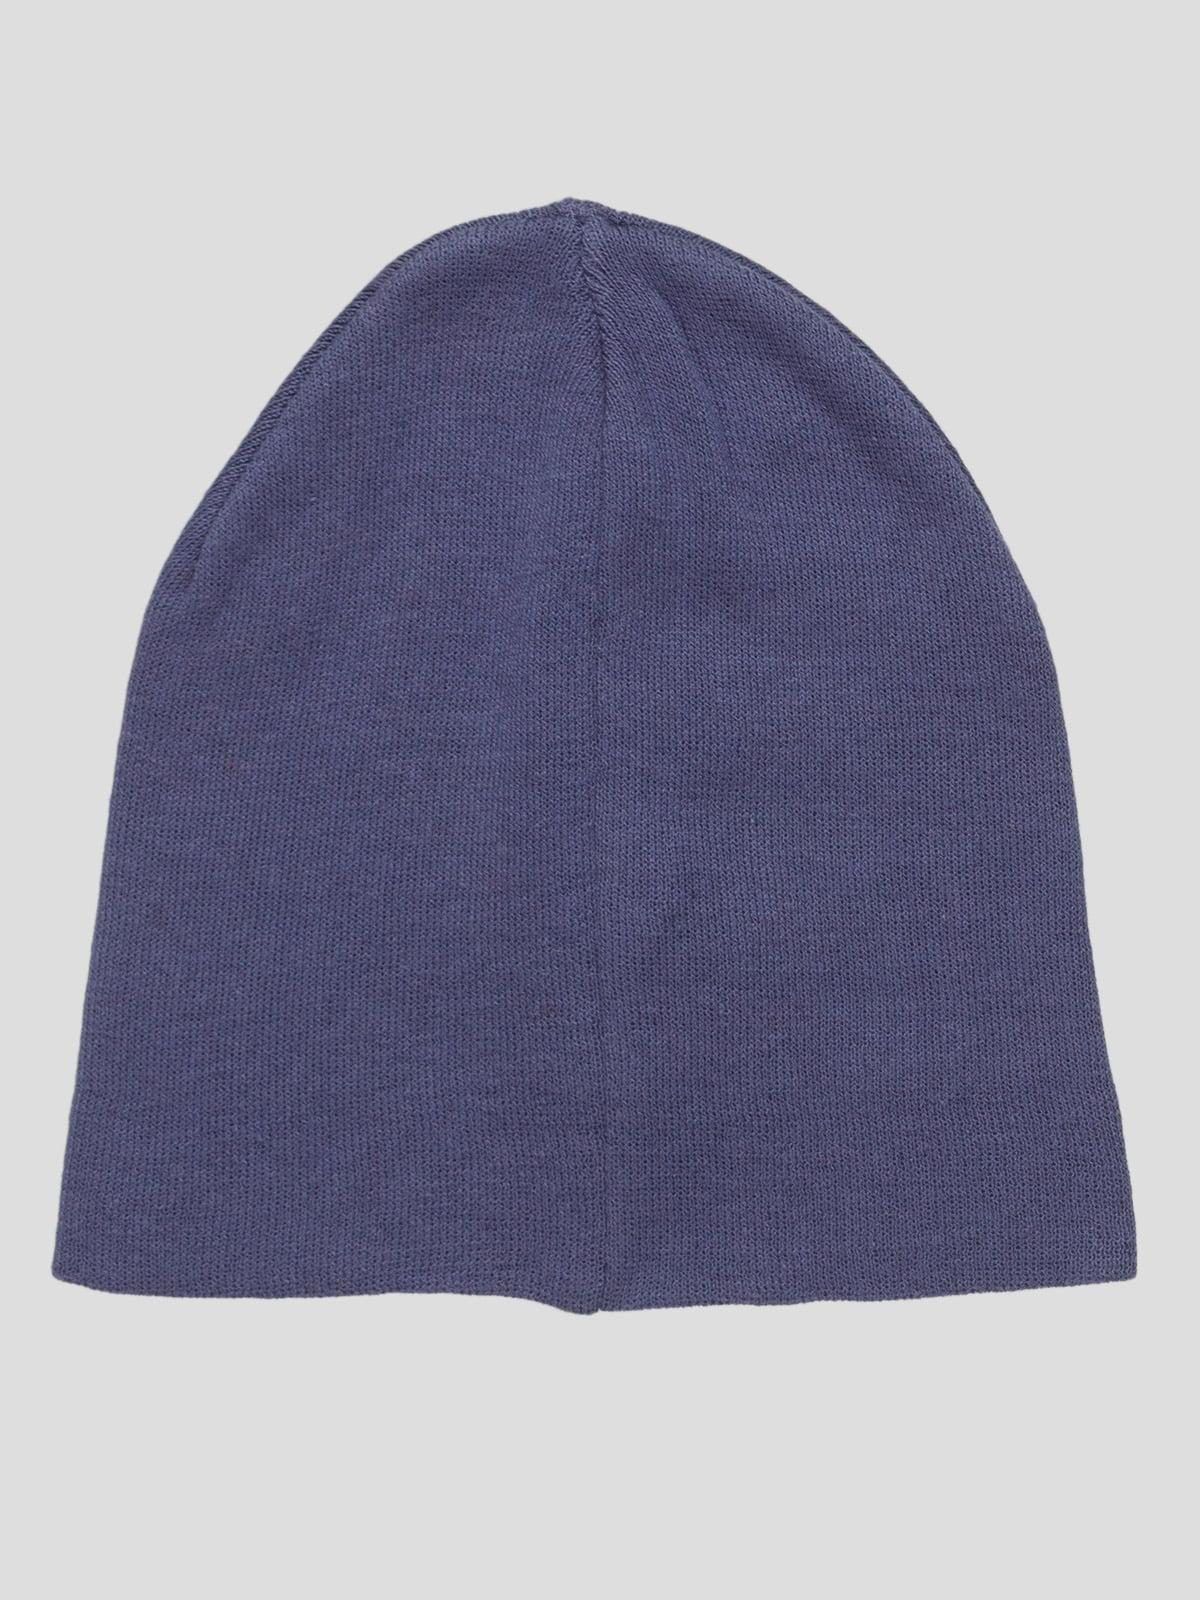 Шапка синяя   4575189